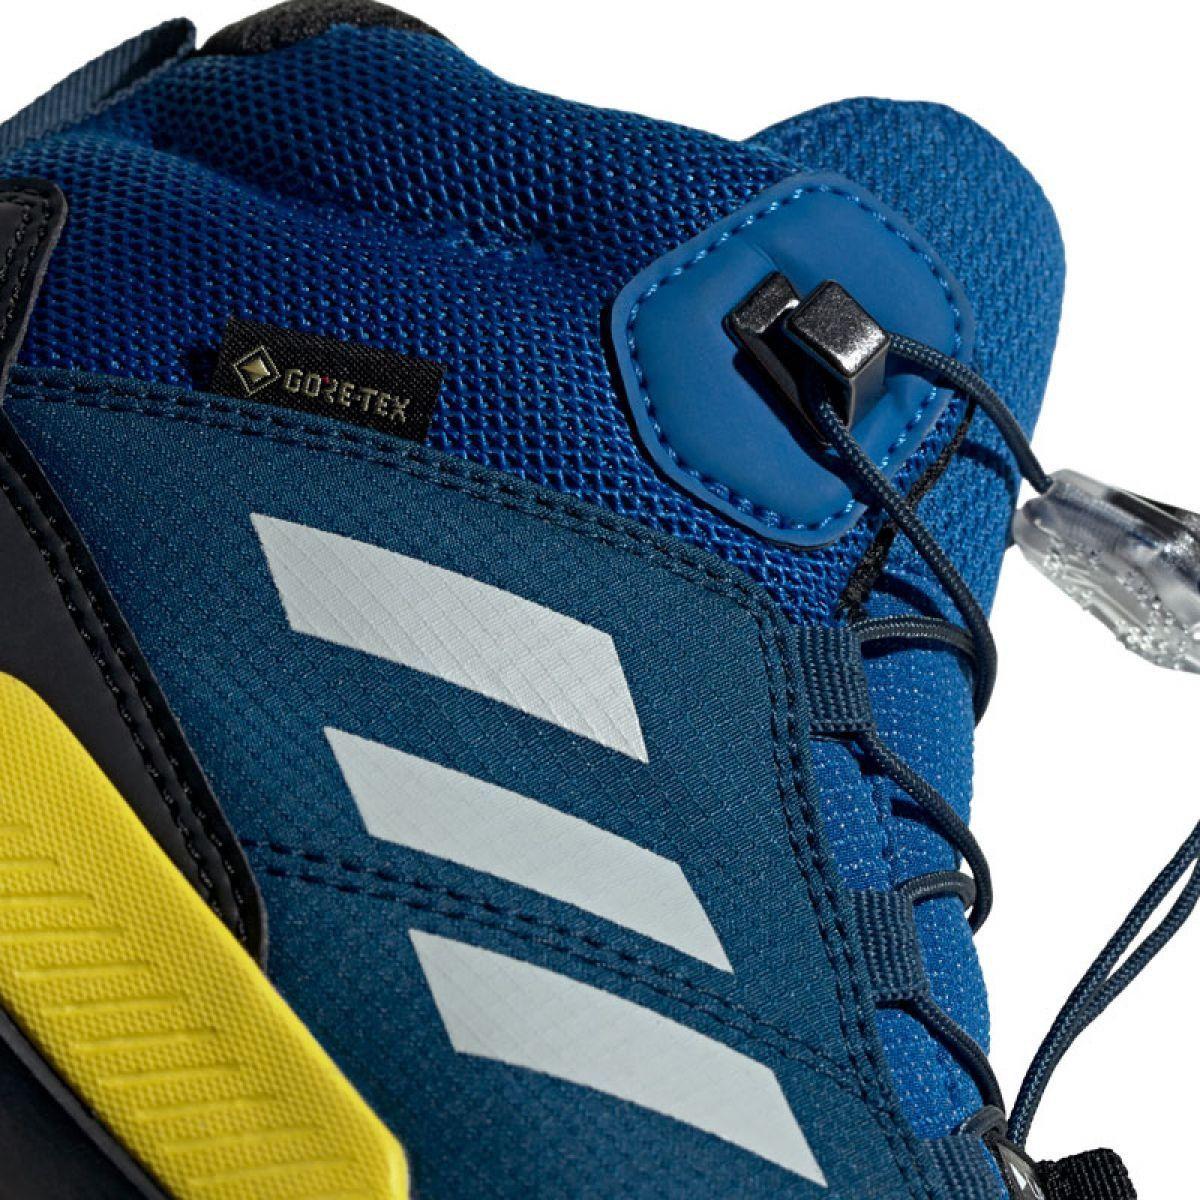 Buty Adidas Terrex Mid Gtx Jr Bc0596 Czarne Niebieskie Zielone Adidas Junior Shoes Durable Shoes